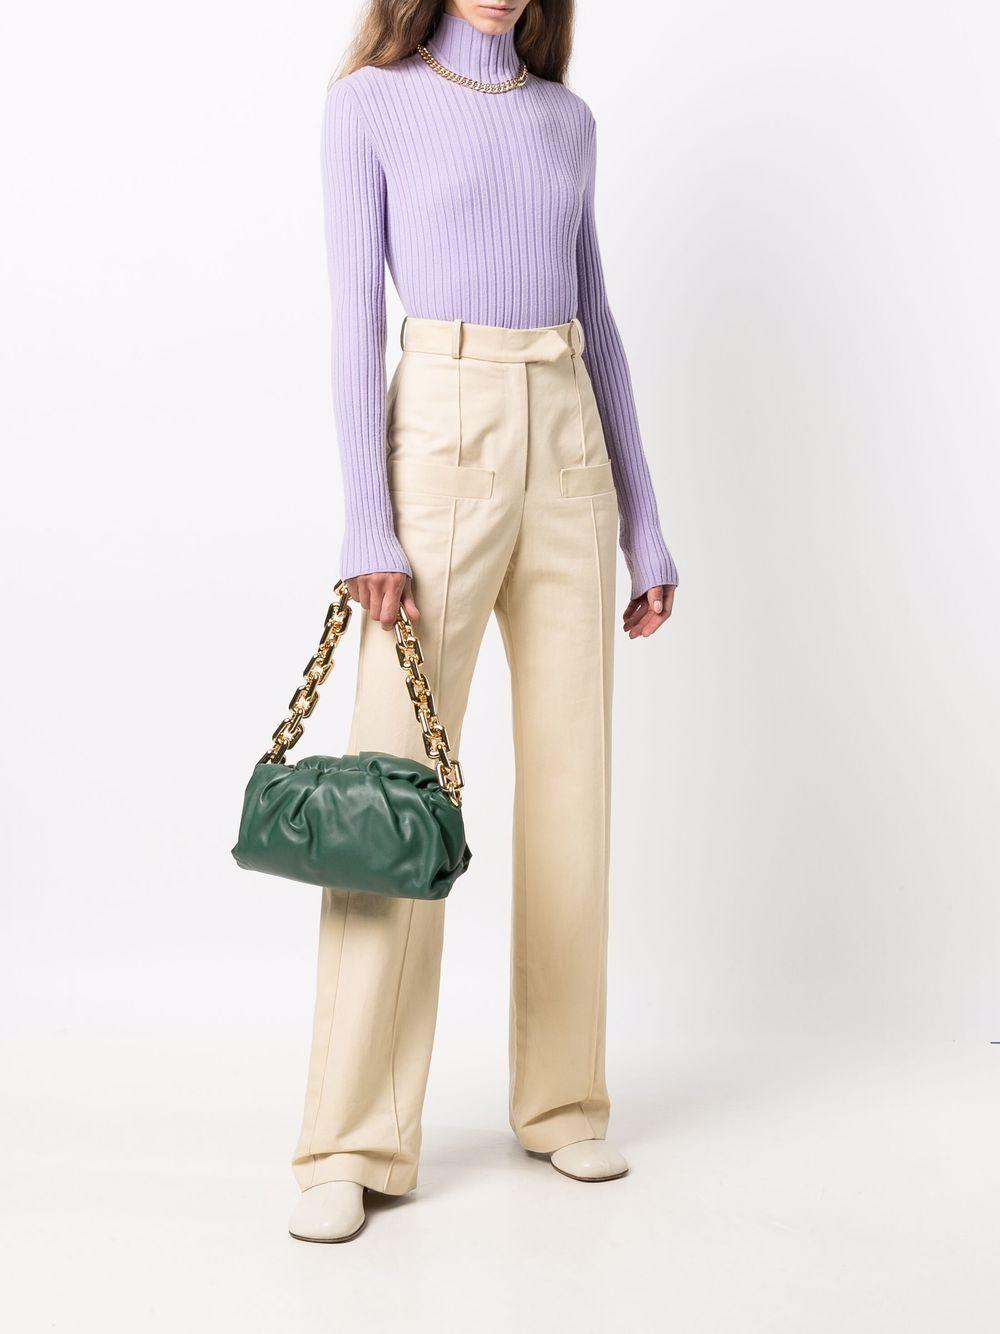 Picture of Bottega Veneta | The Chain Pouch Shoulder Bag